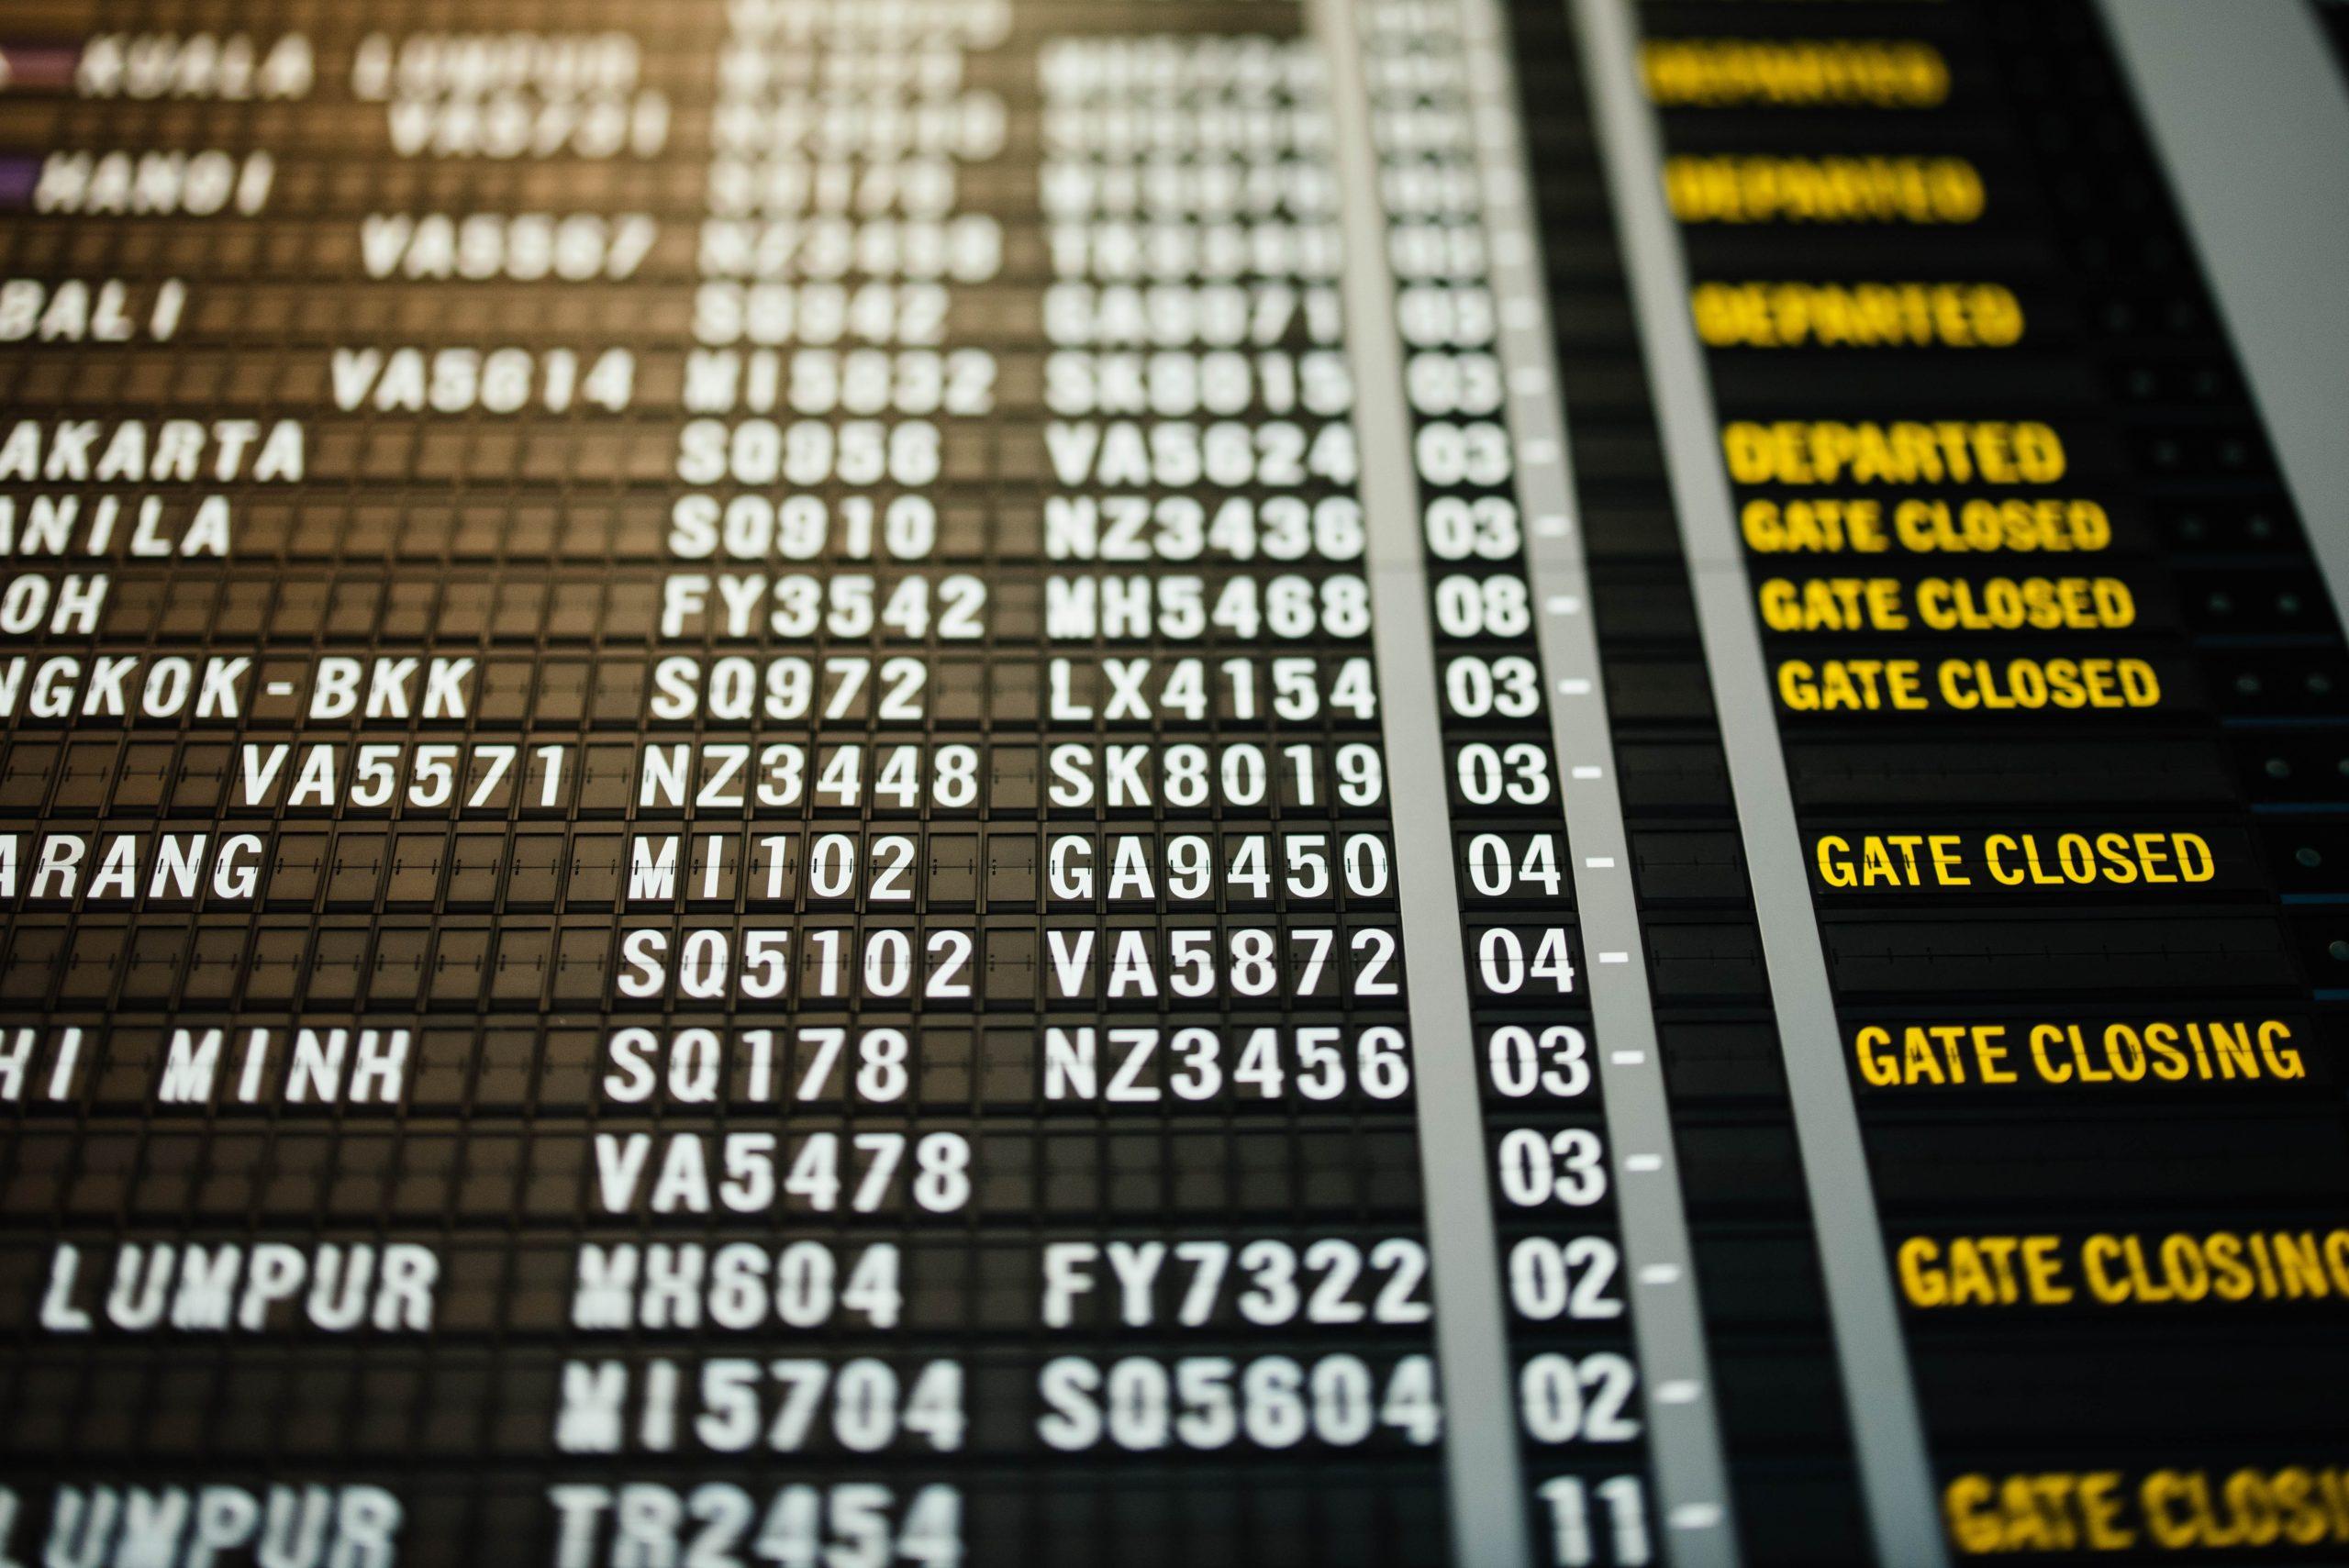 Coronavirus : Formalités pour voyager en Europe - Okarito